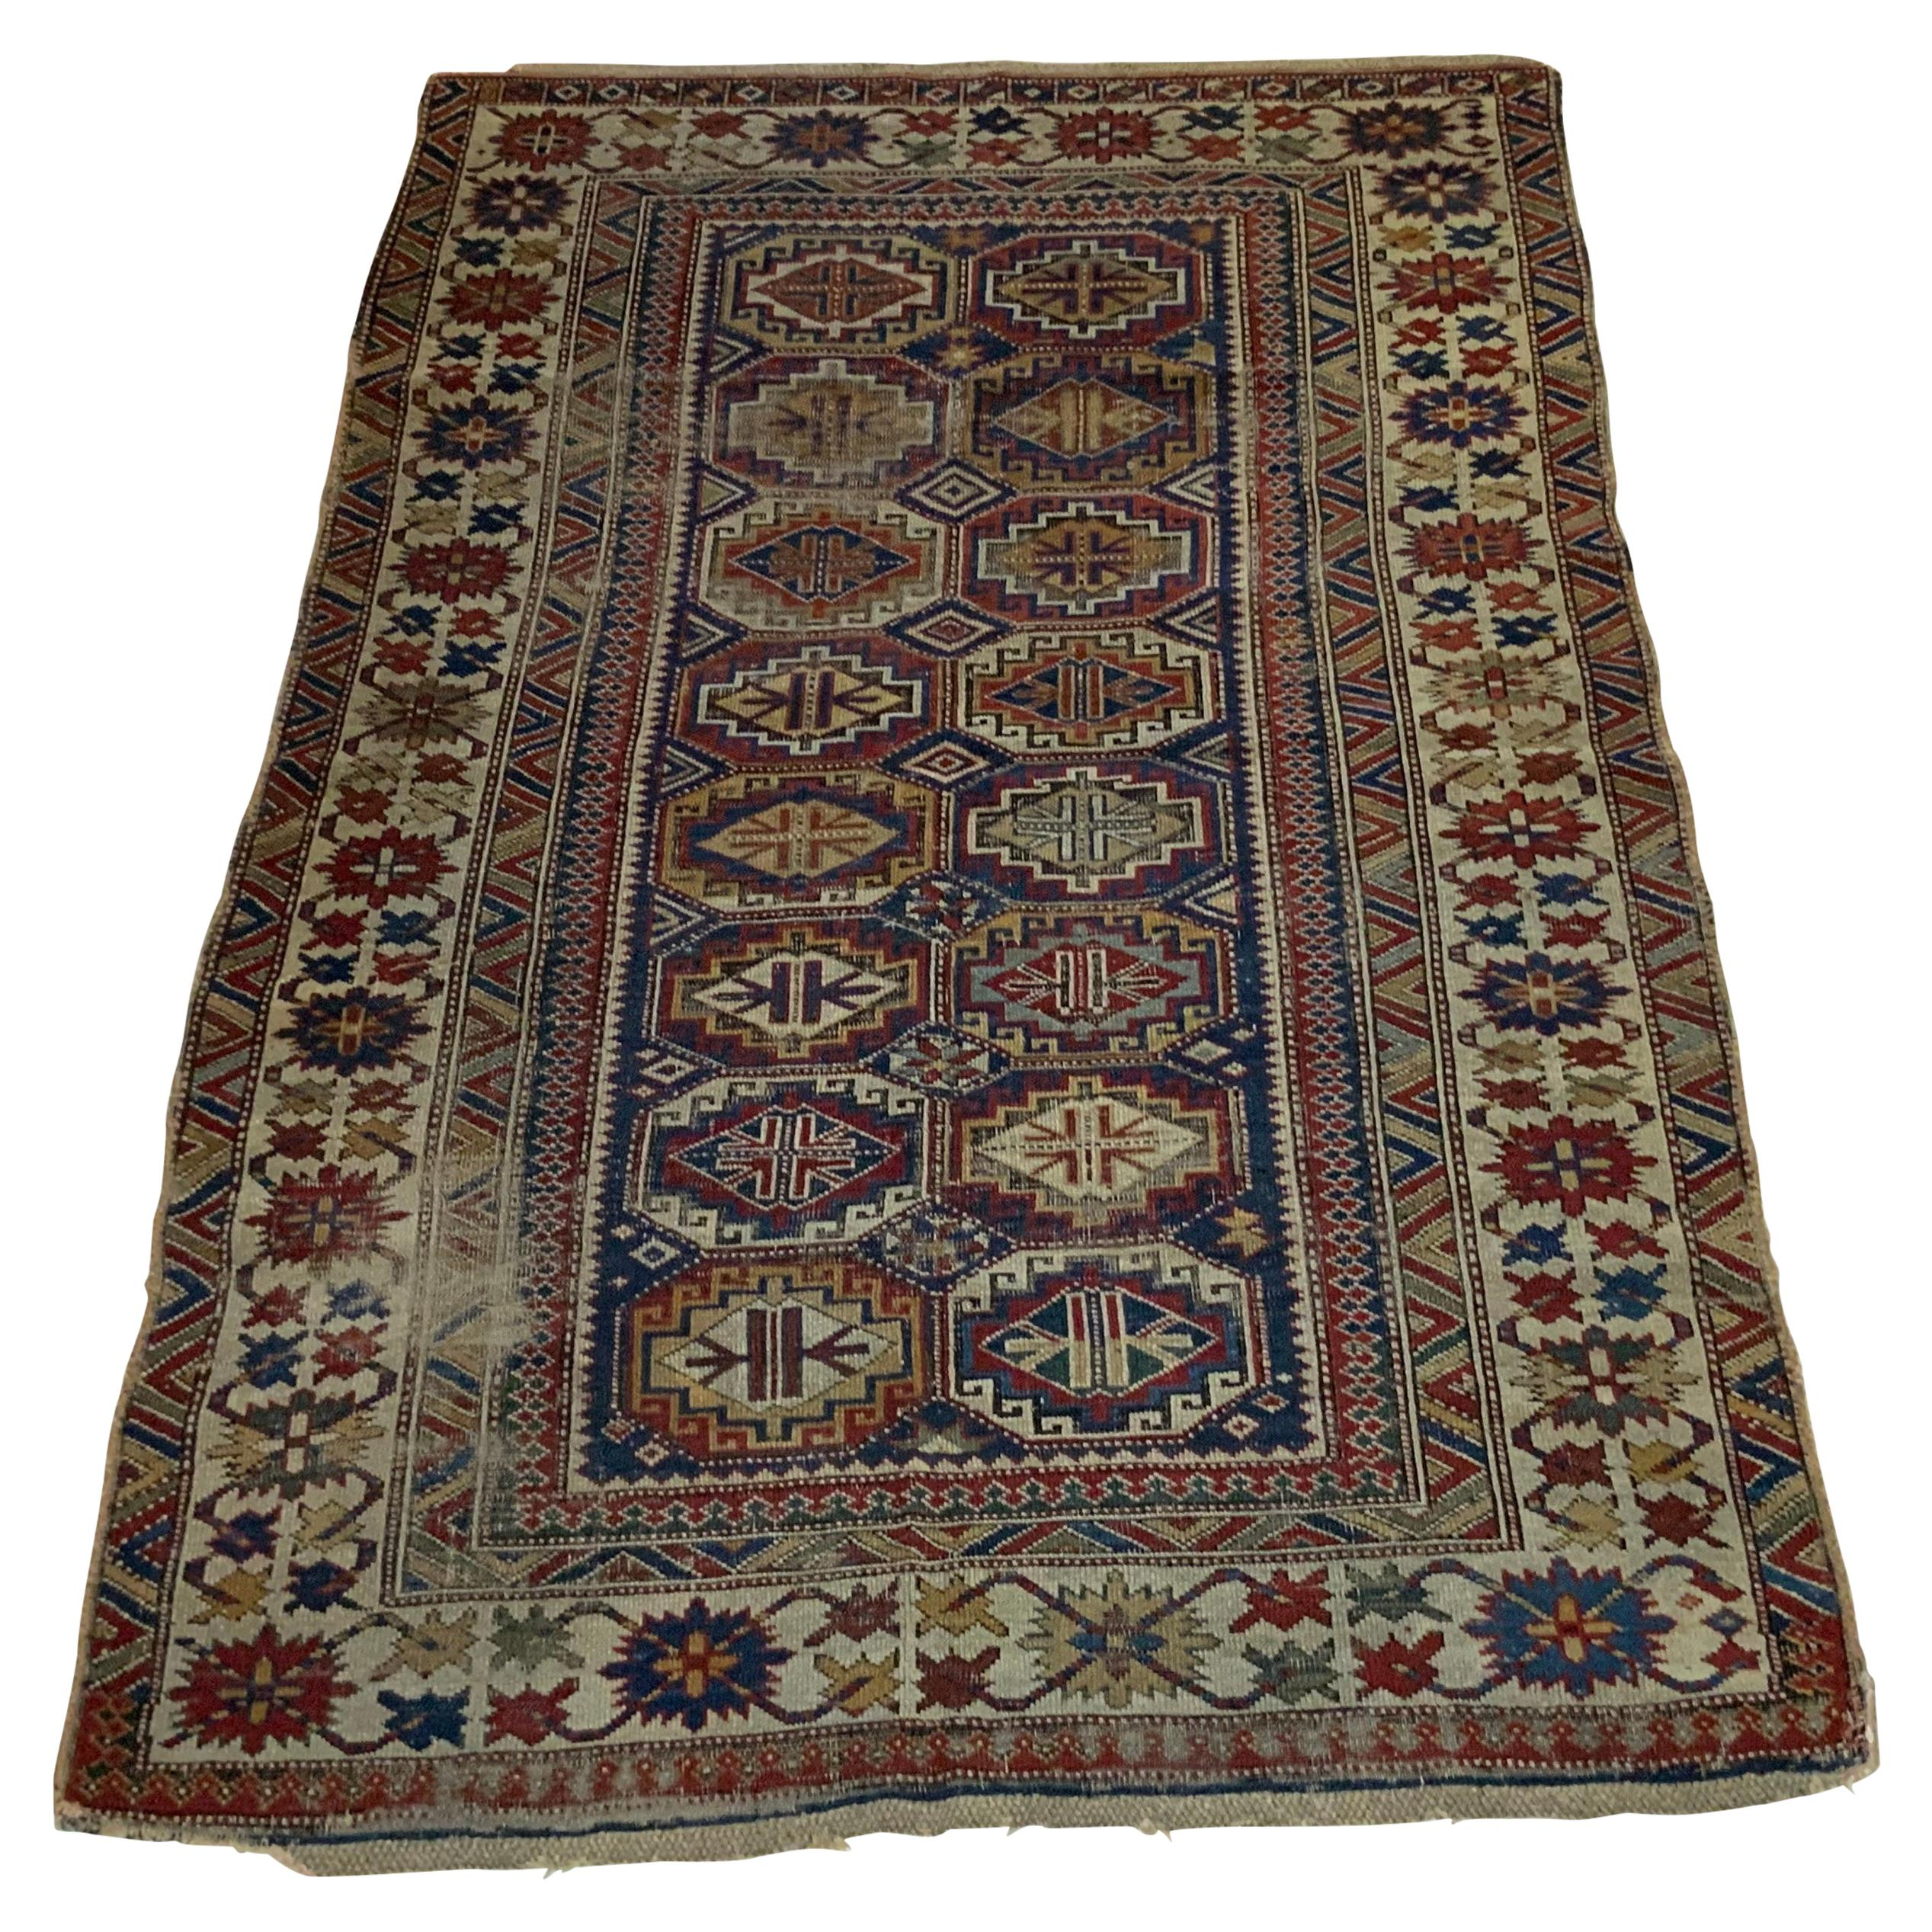 Antique Geometric Motifs Caucasian Shirvan Rug